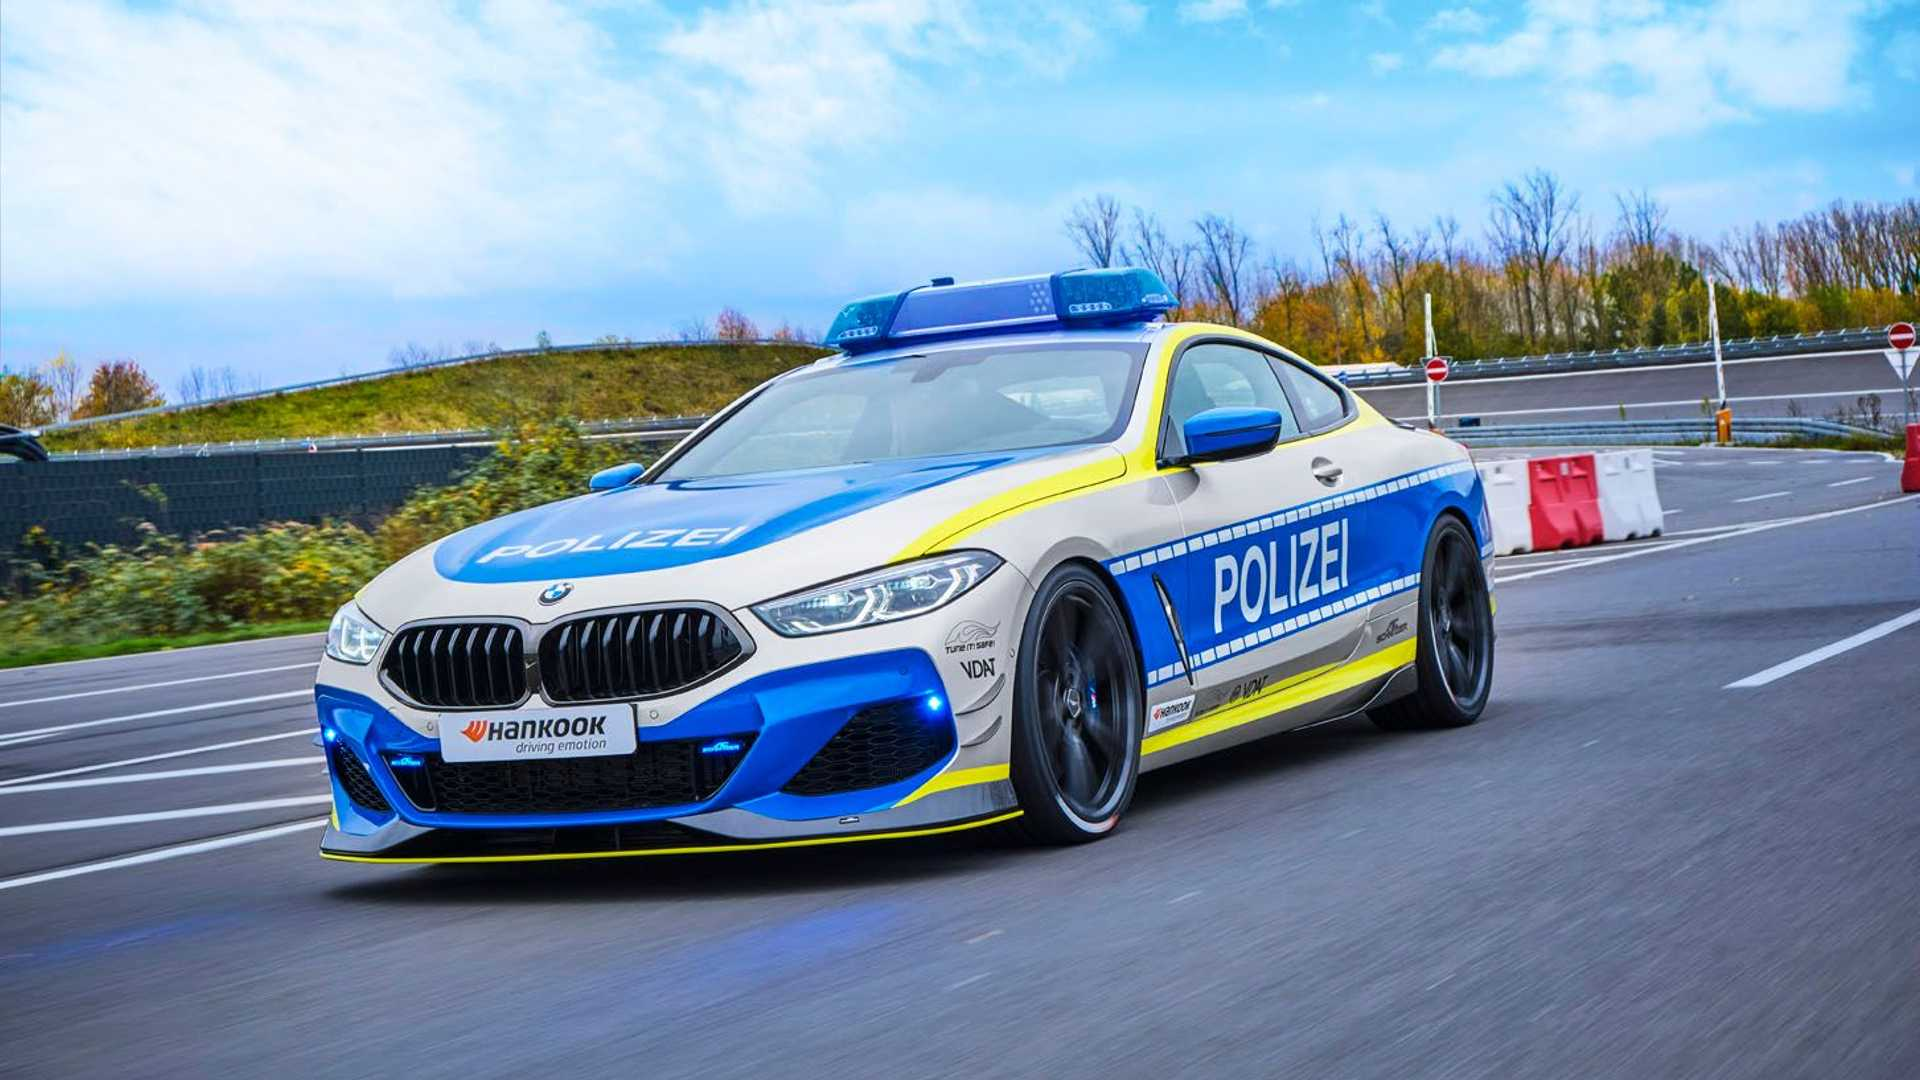 BMW-M850i-police-car-tune-it-safe-17